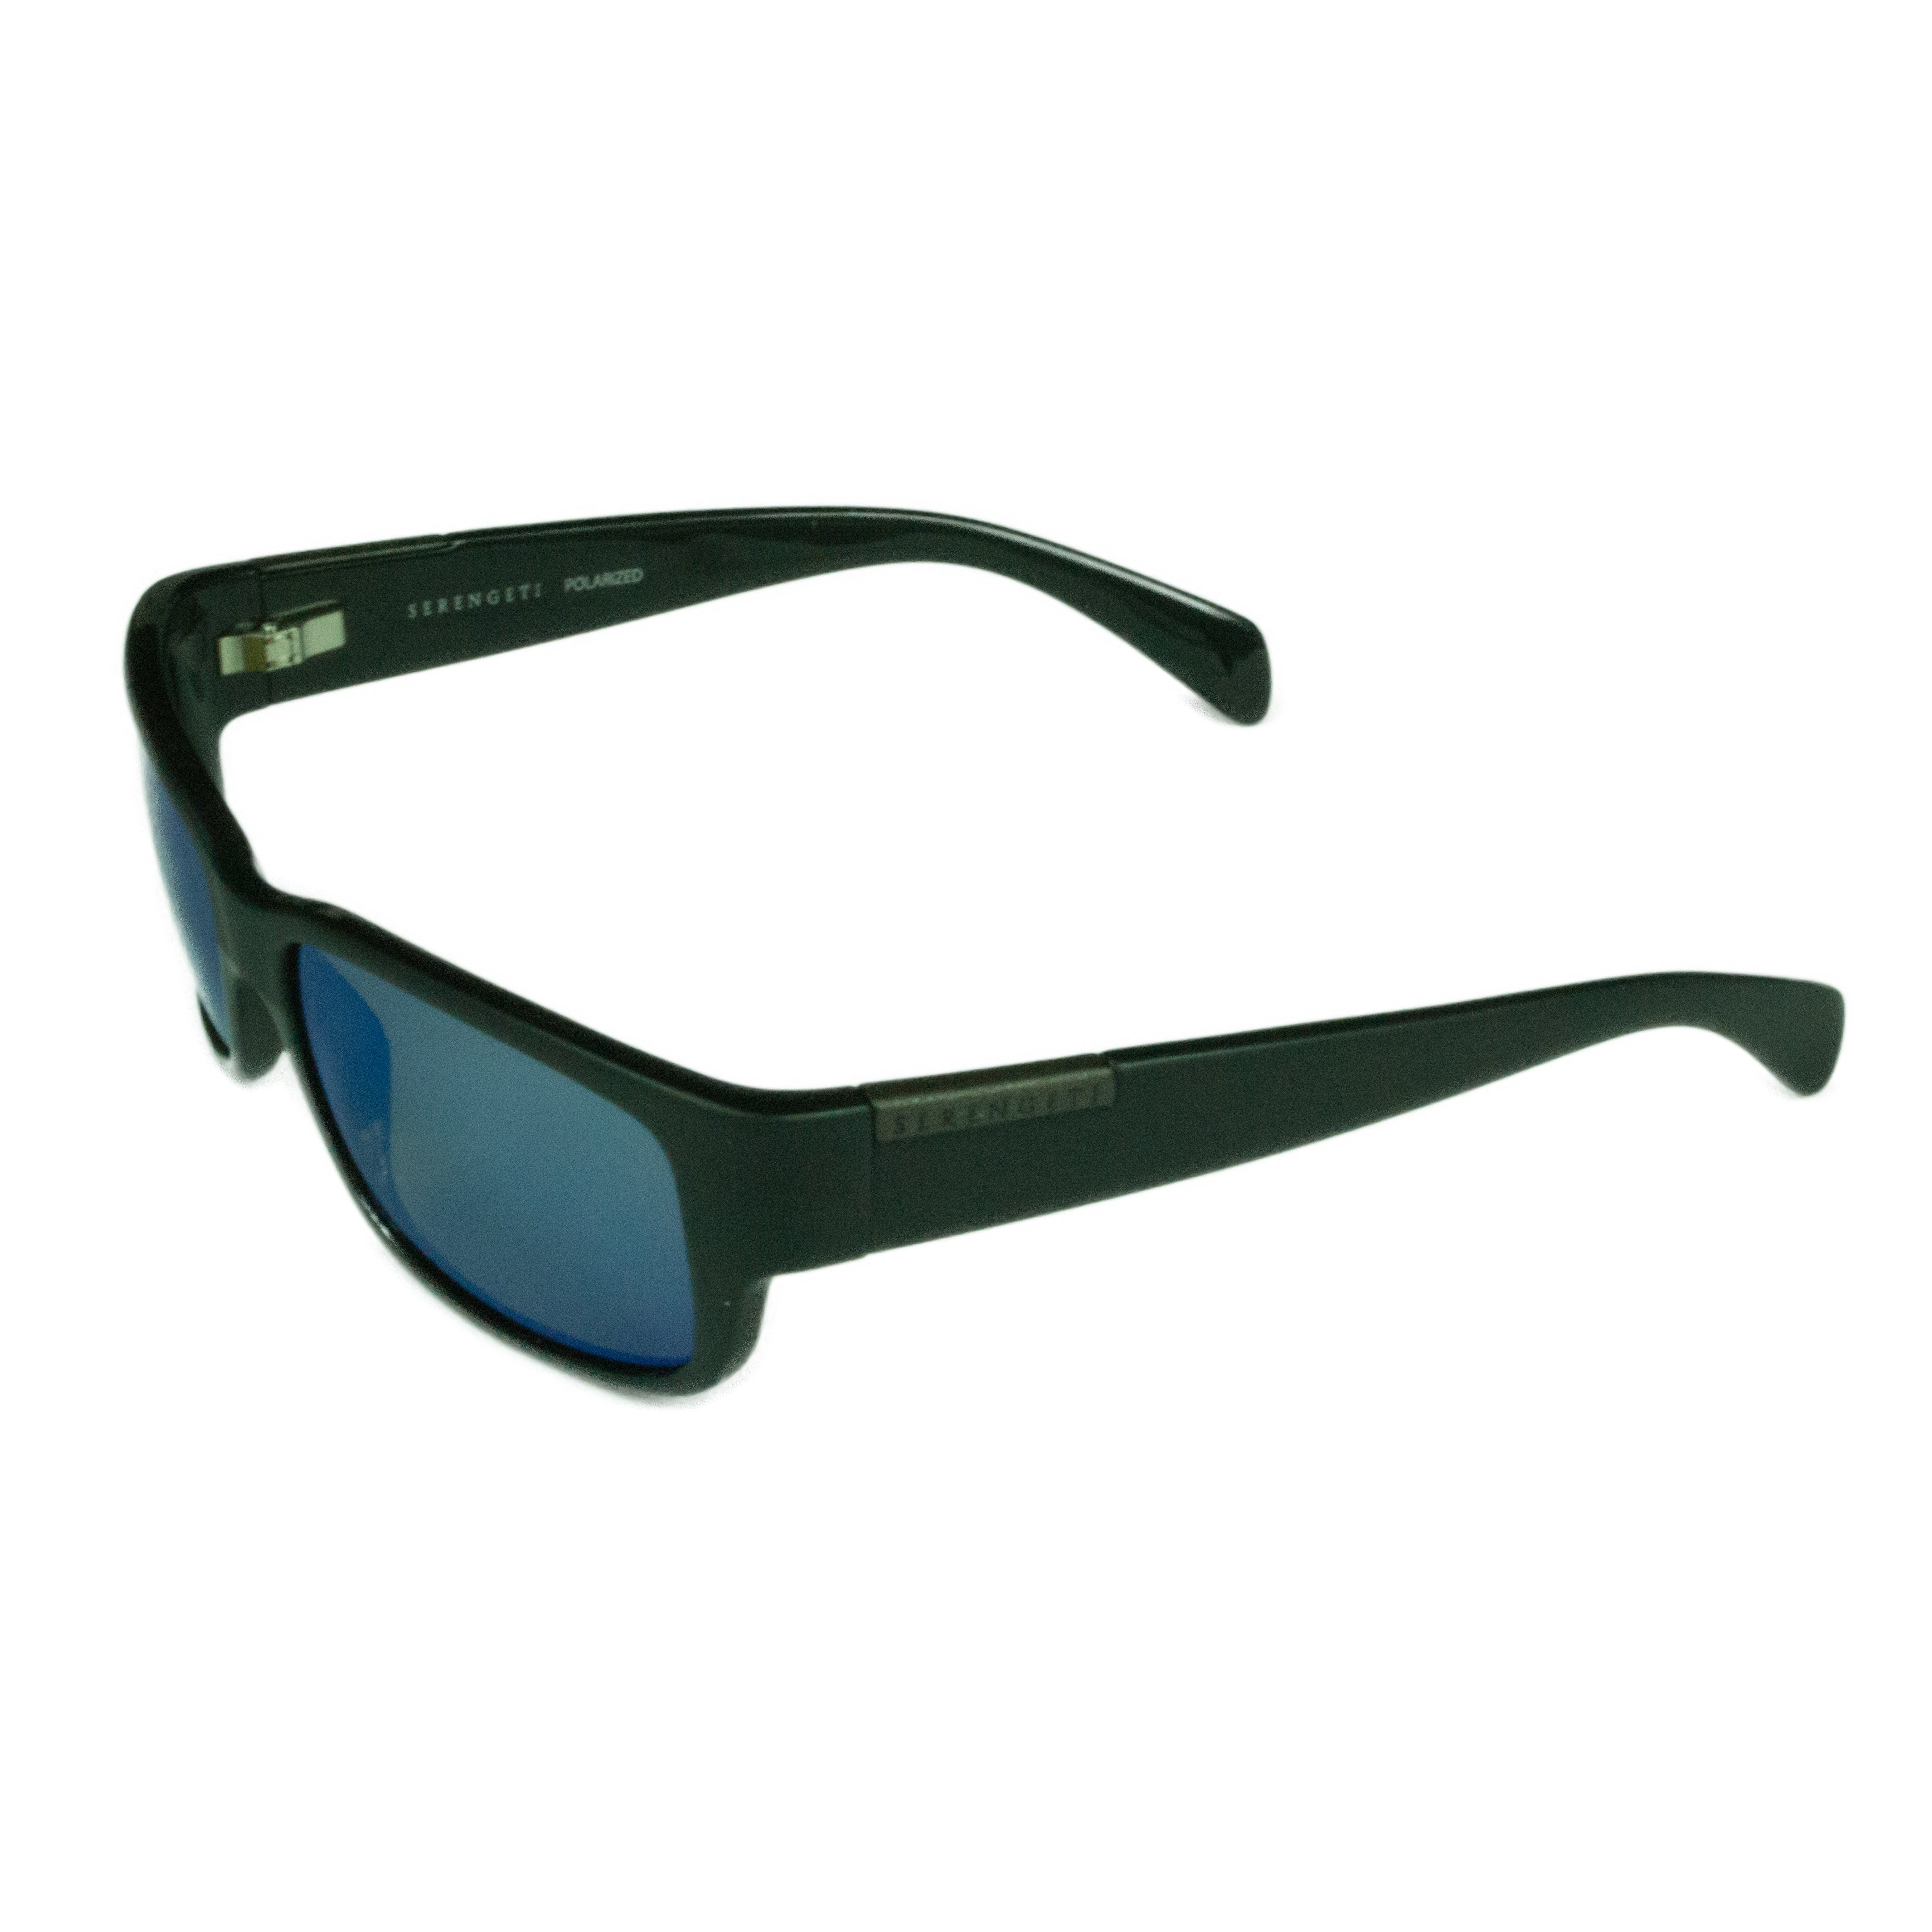 84cbf94bcc Serengeti Fashion Unisex Merano 8267 Satin Shiny Black w  Polarized 555NM  Blue Mirror Lens Sunglasses